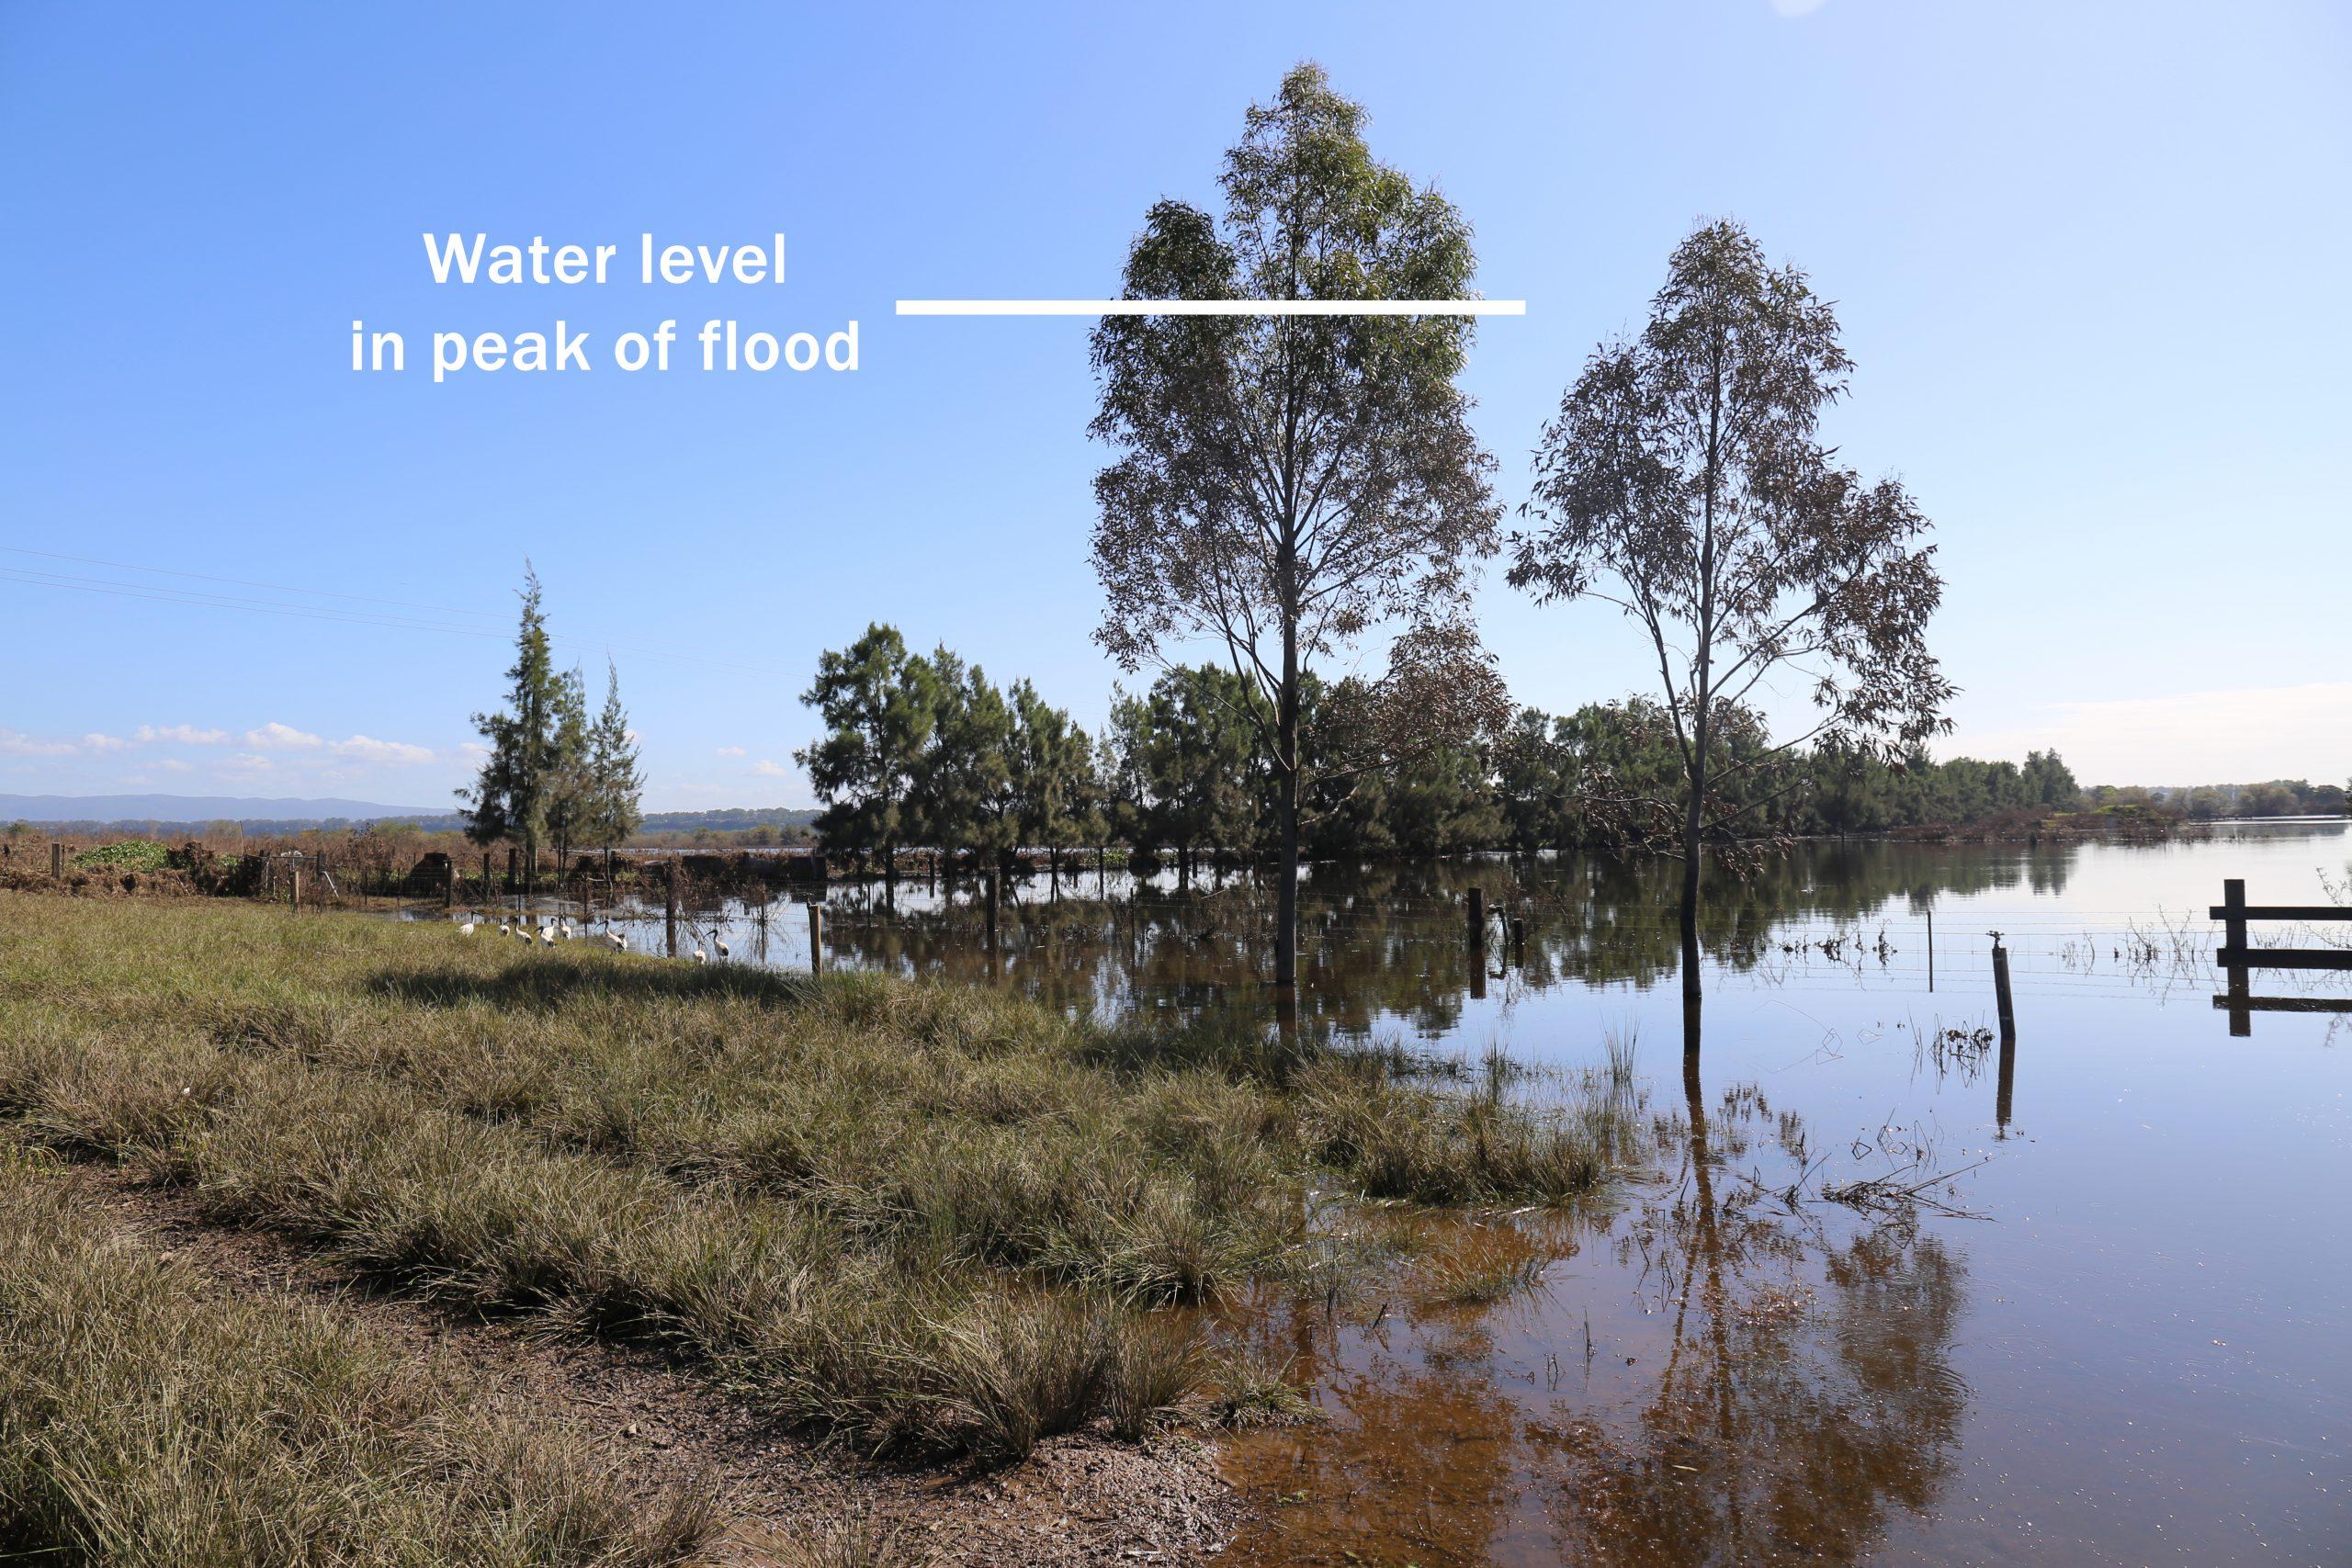 Shara Lomandra 2021 Flood Richmond Indicating Peak Water Level